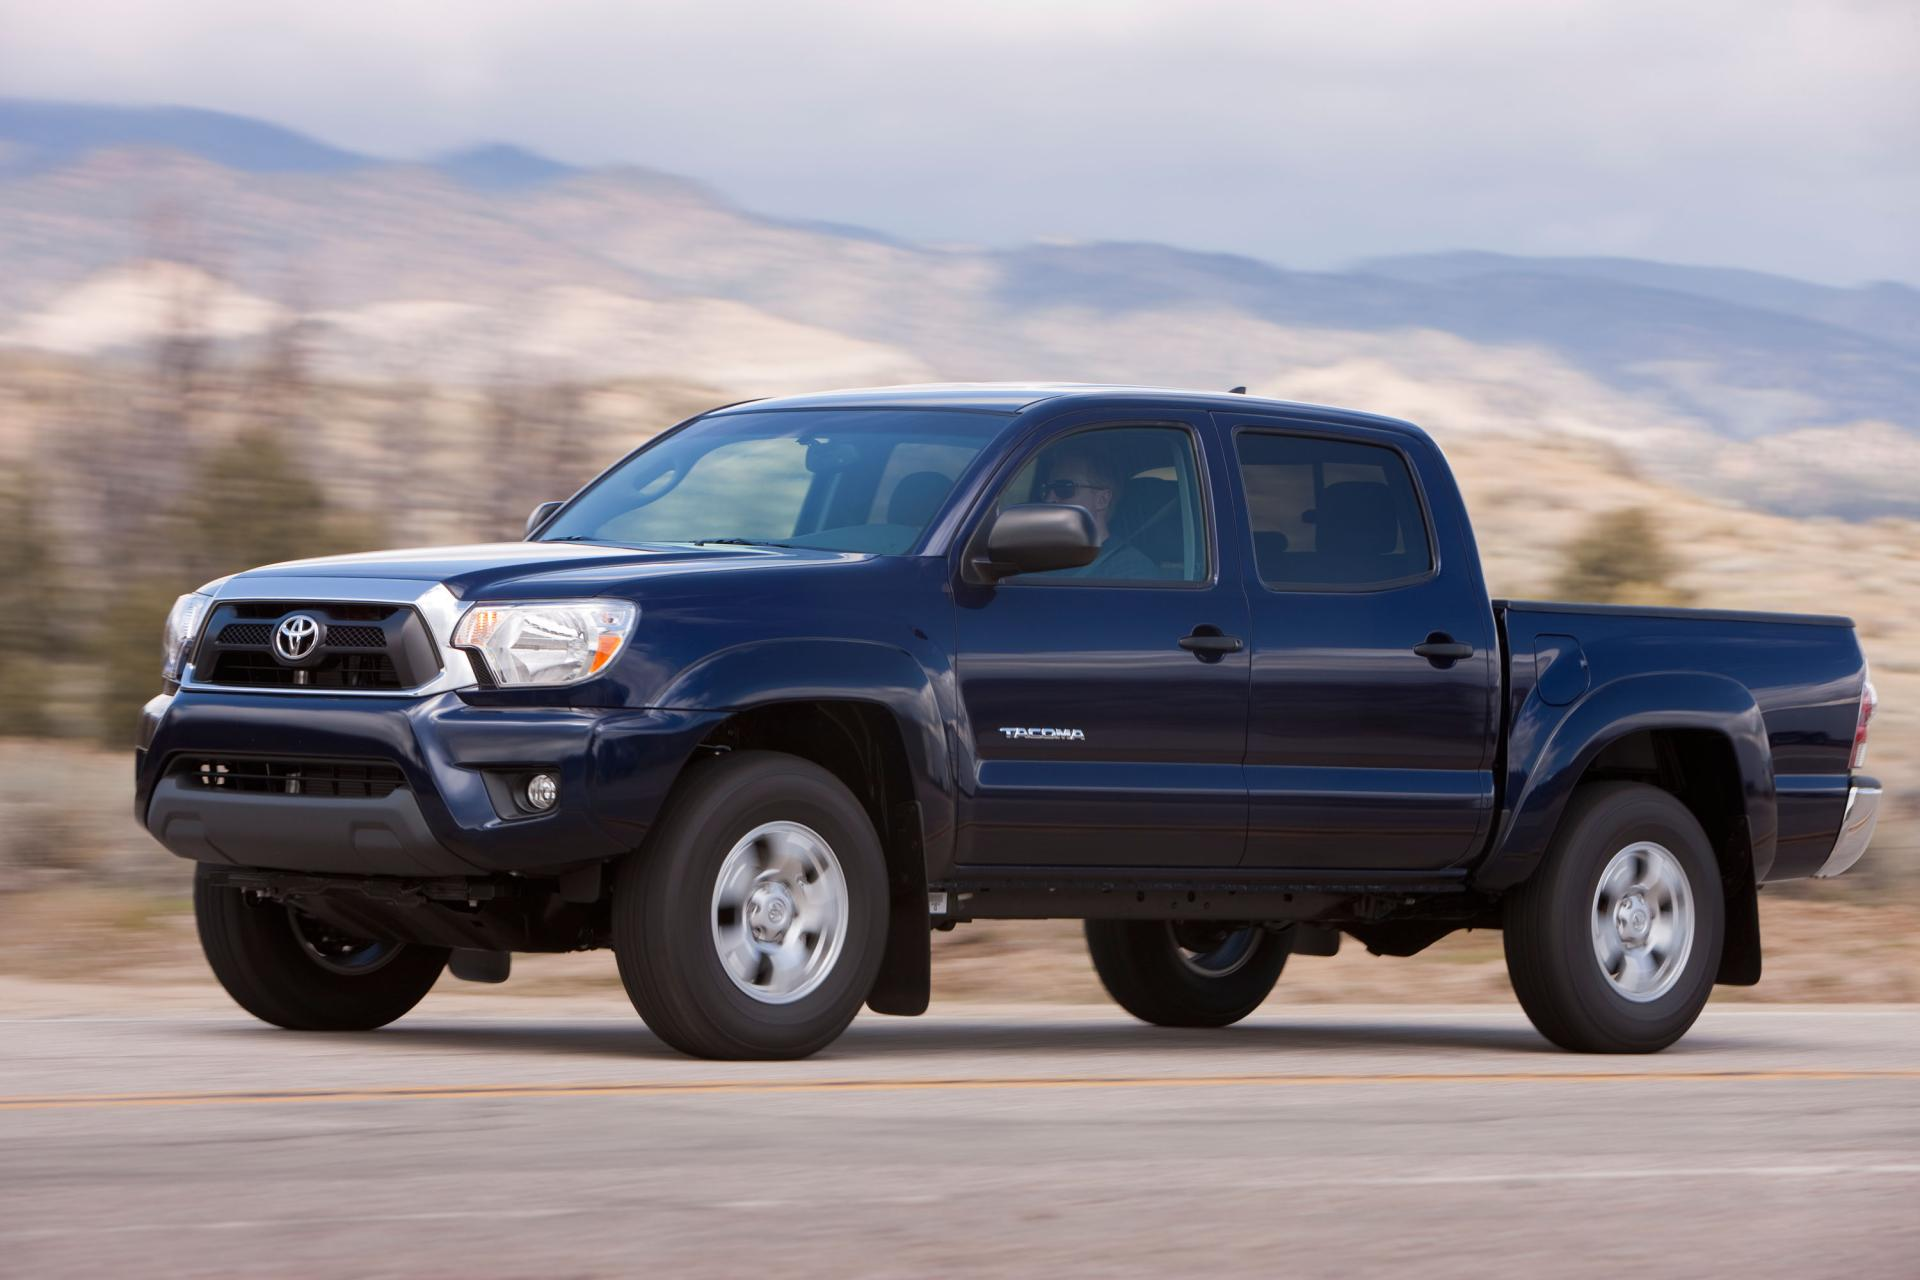 carsforsale xsp fl tacoma x stock for compare toyota used truck miami in sale price